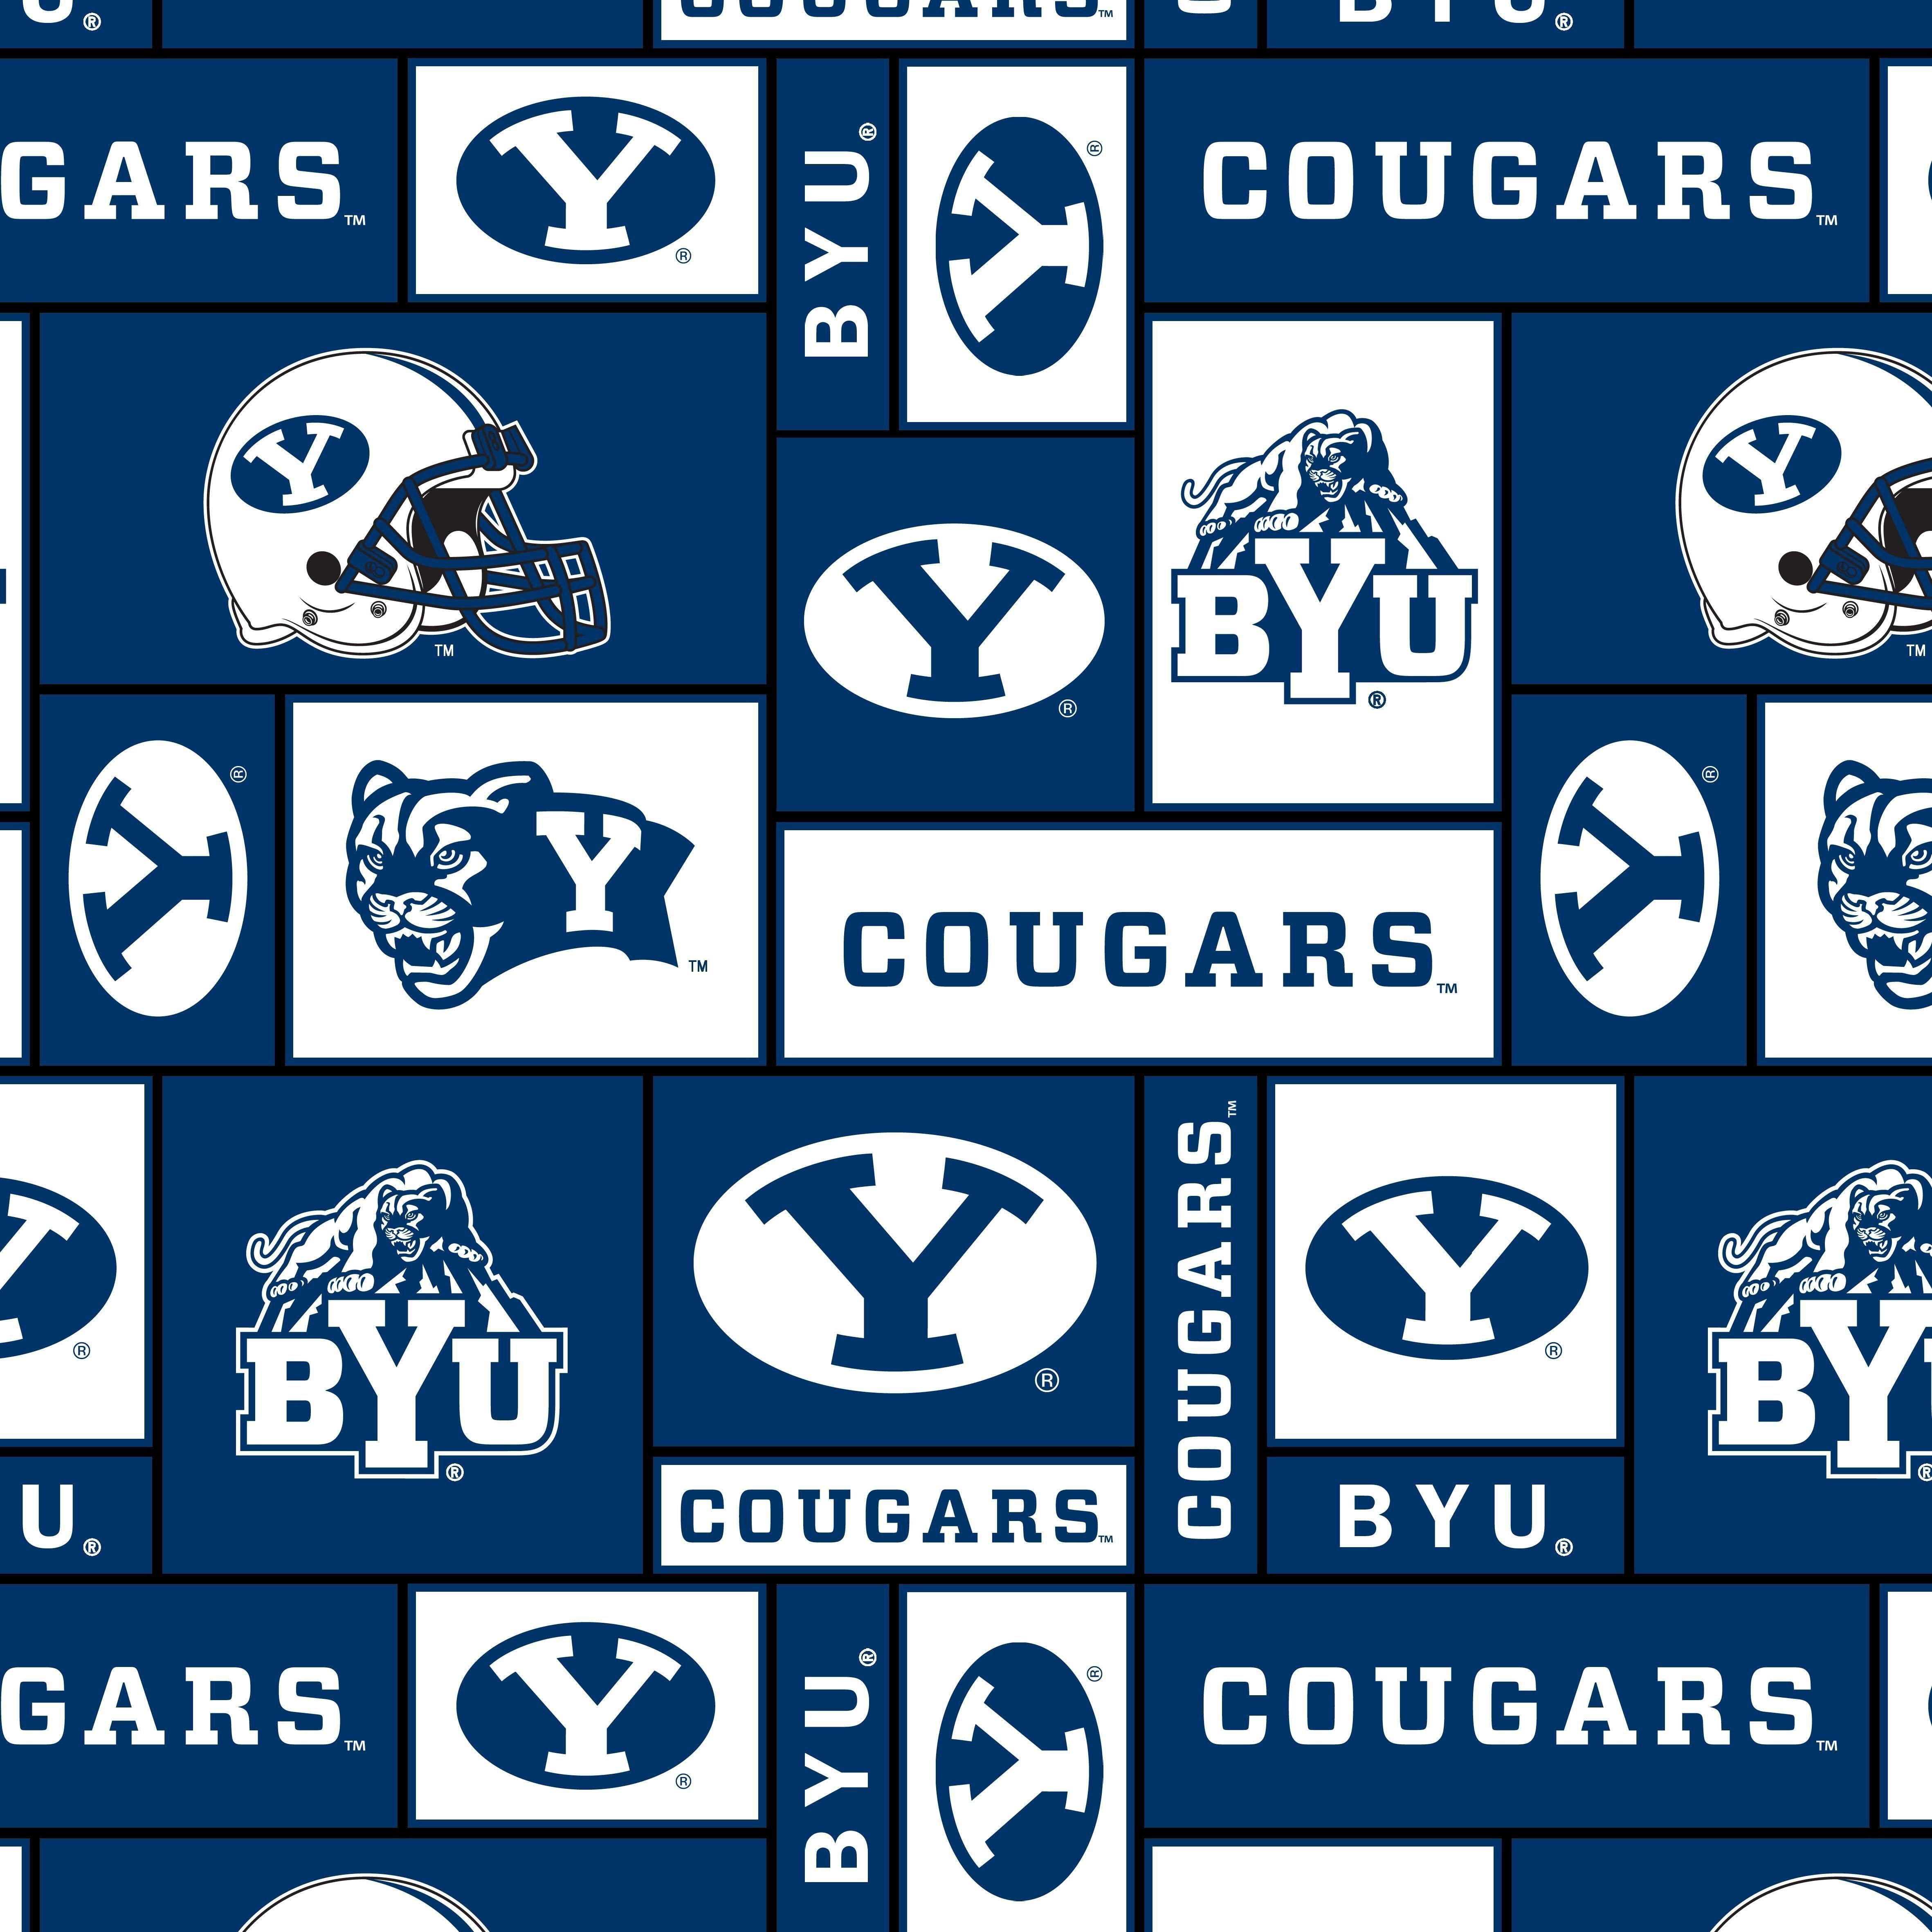 Brigham Young University Cougars Fleece Fabric Block Brigham Young University Byu Fleece Fabric